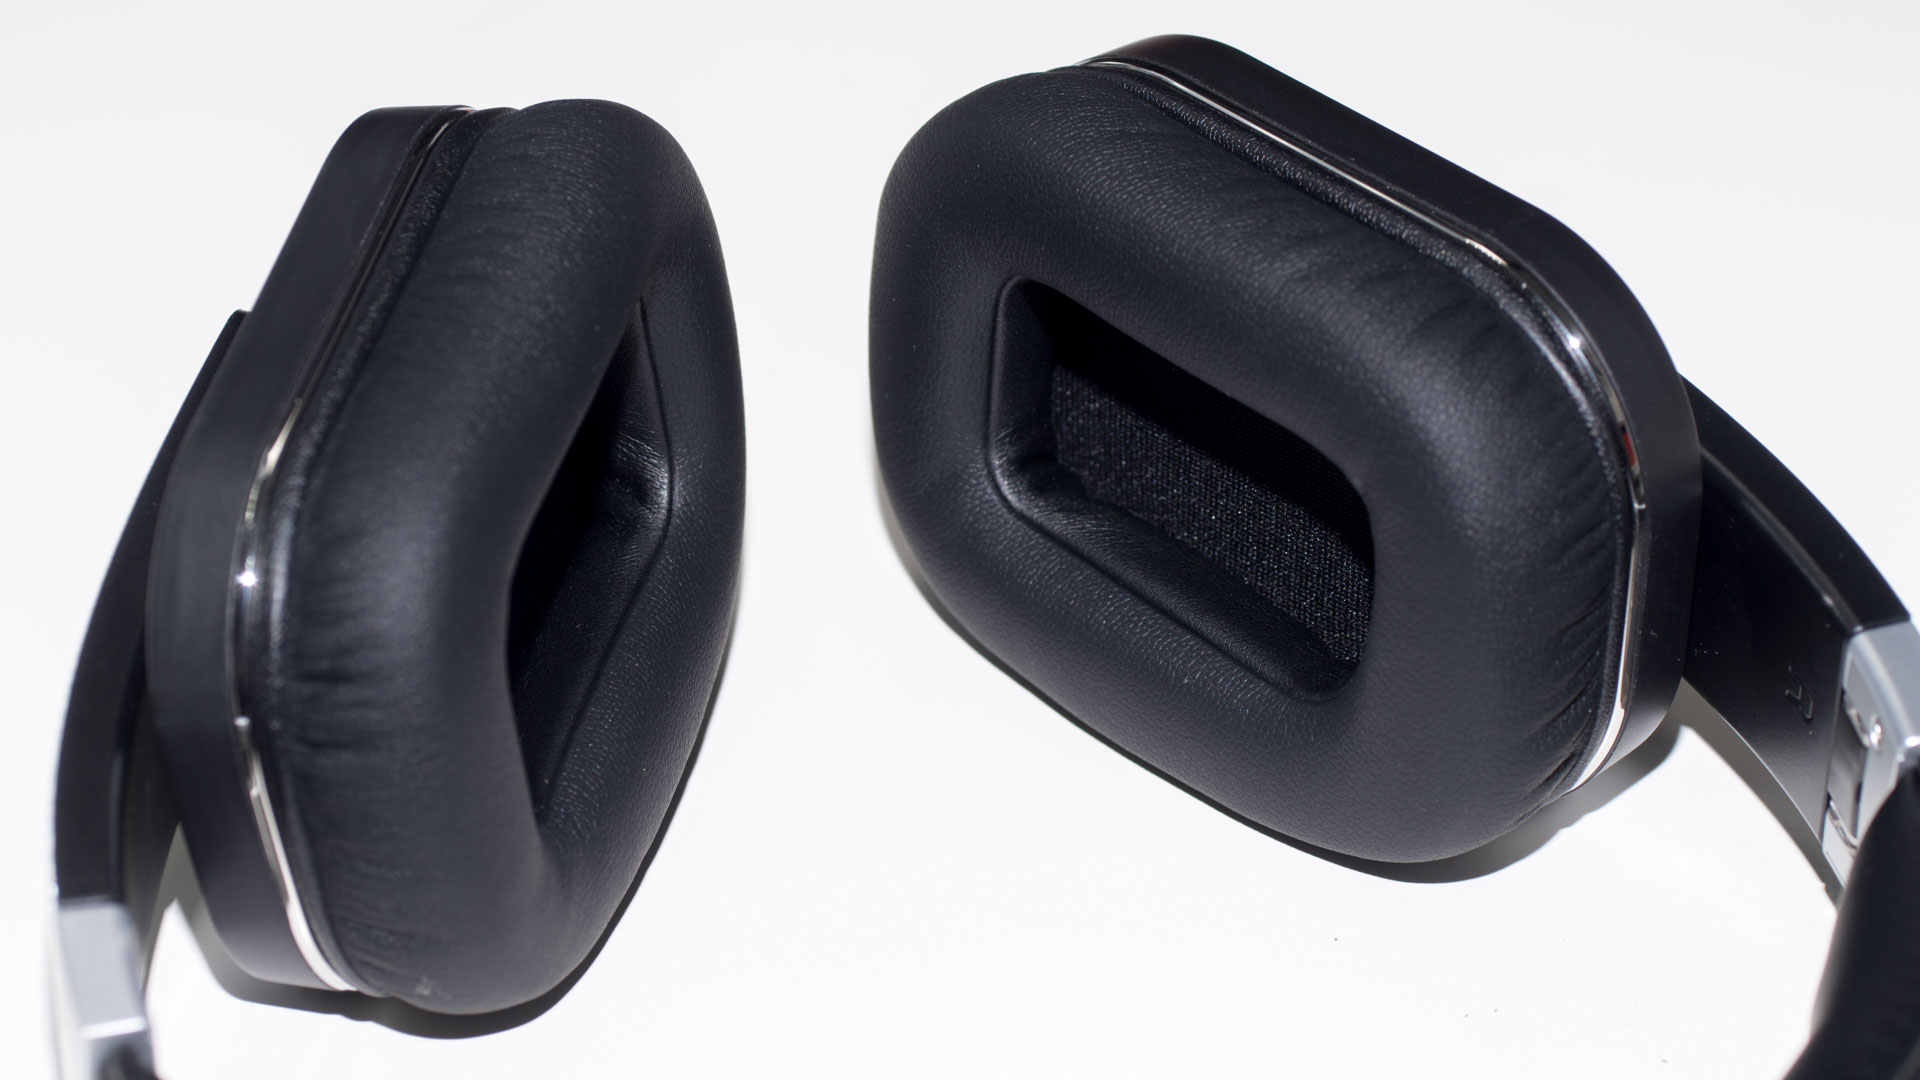 die besten budget bluetooth kopfh rer die audiomx hb 8a. Black Bedroom Furniture Sets. Home Design Ideas